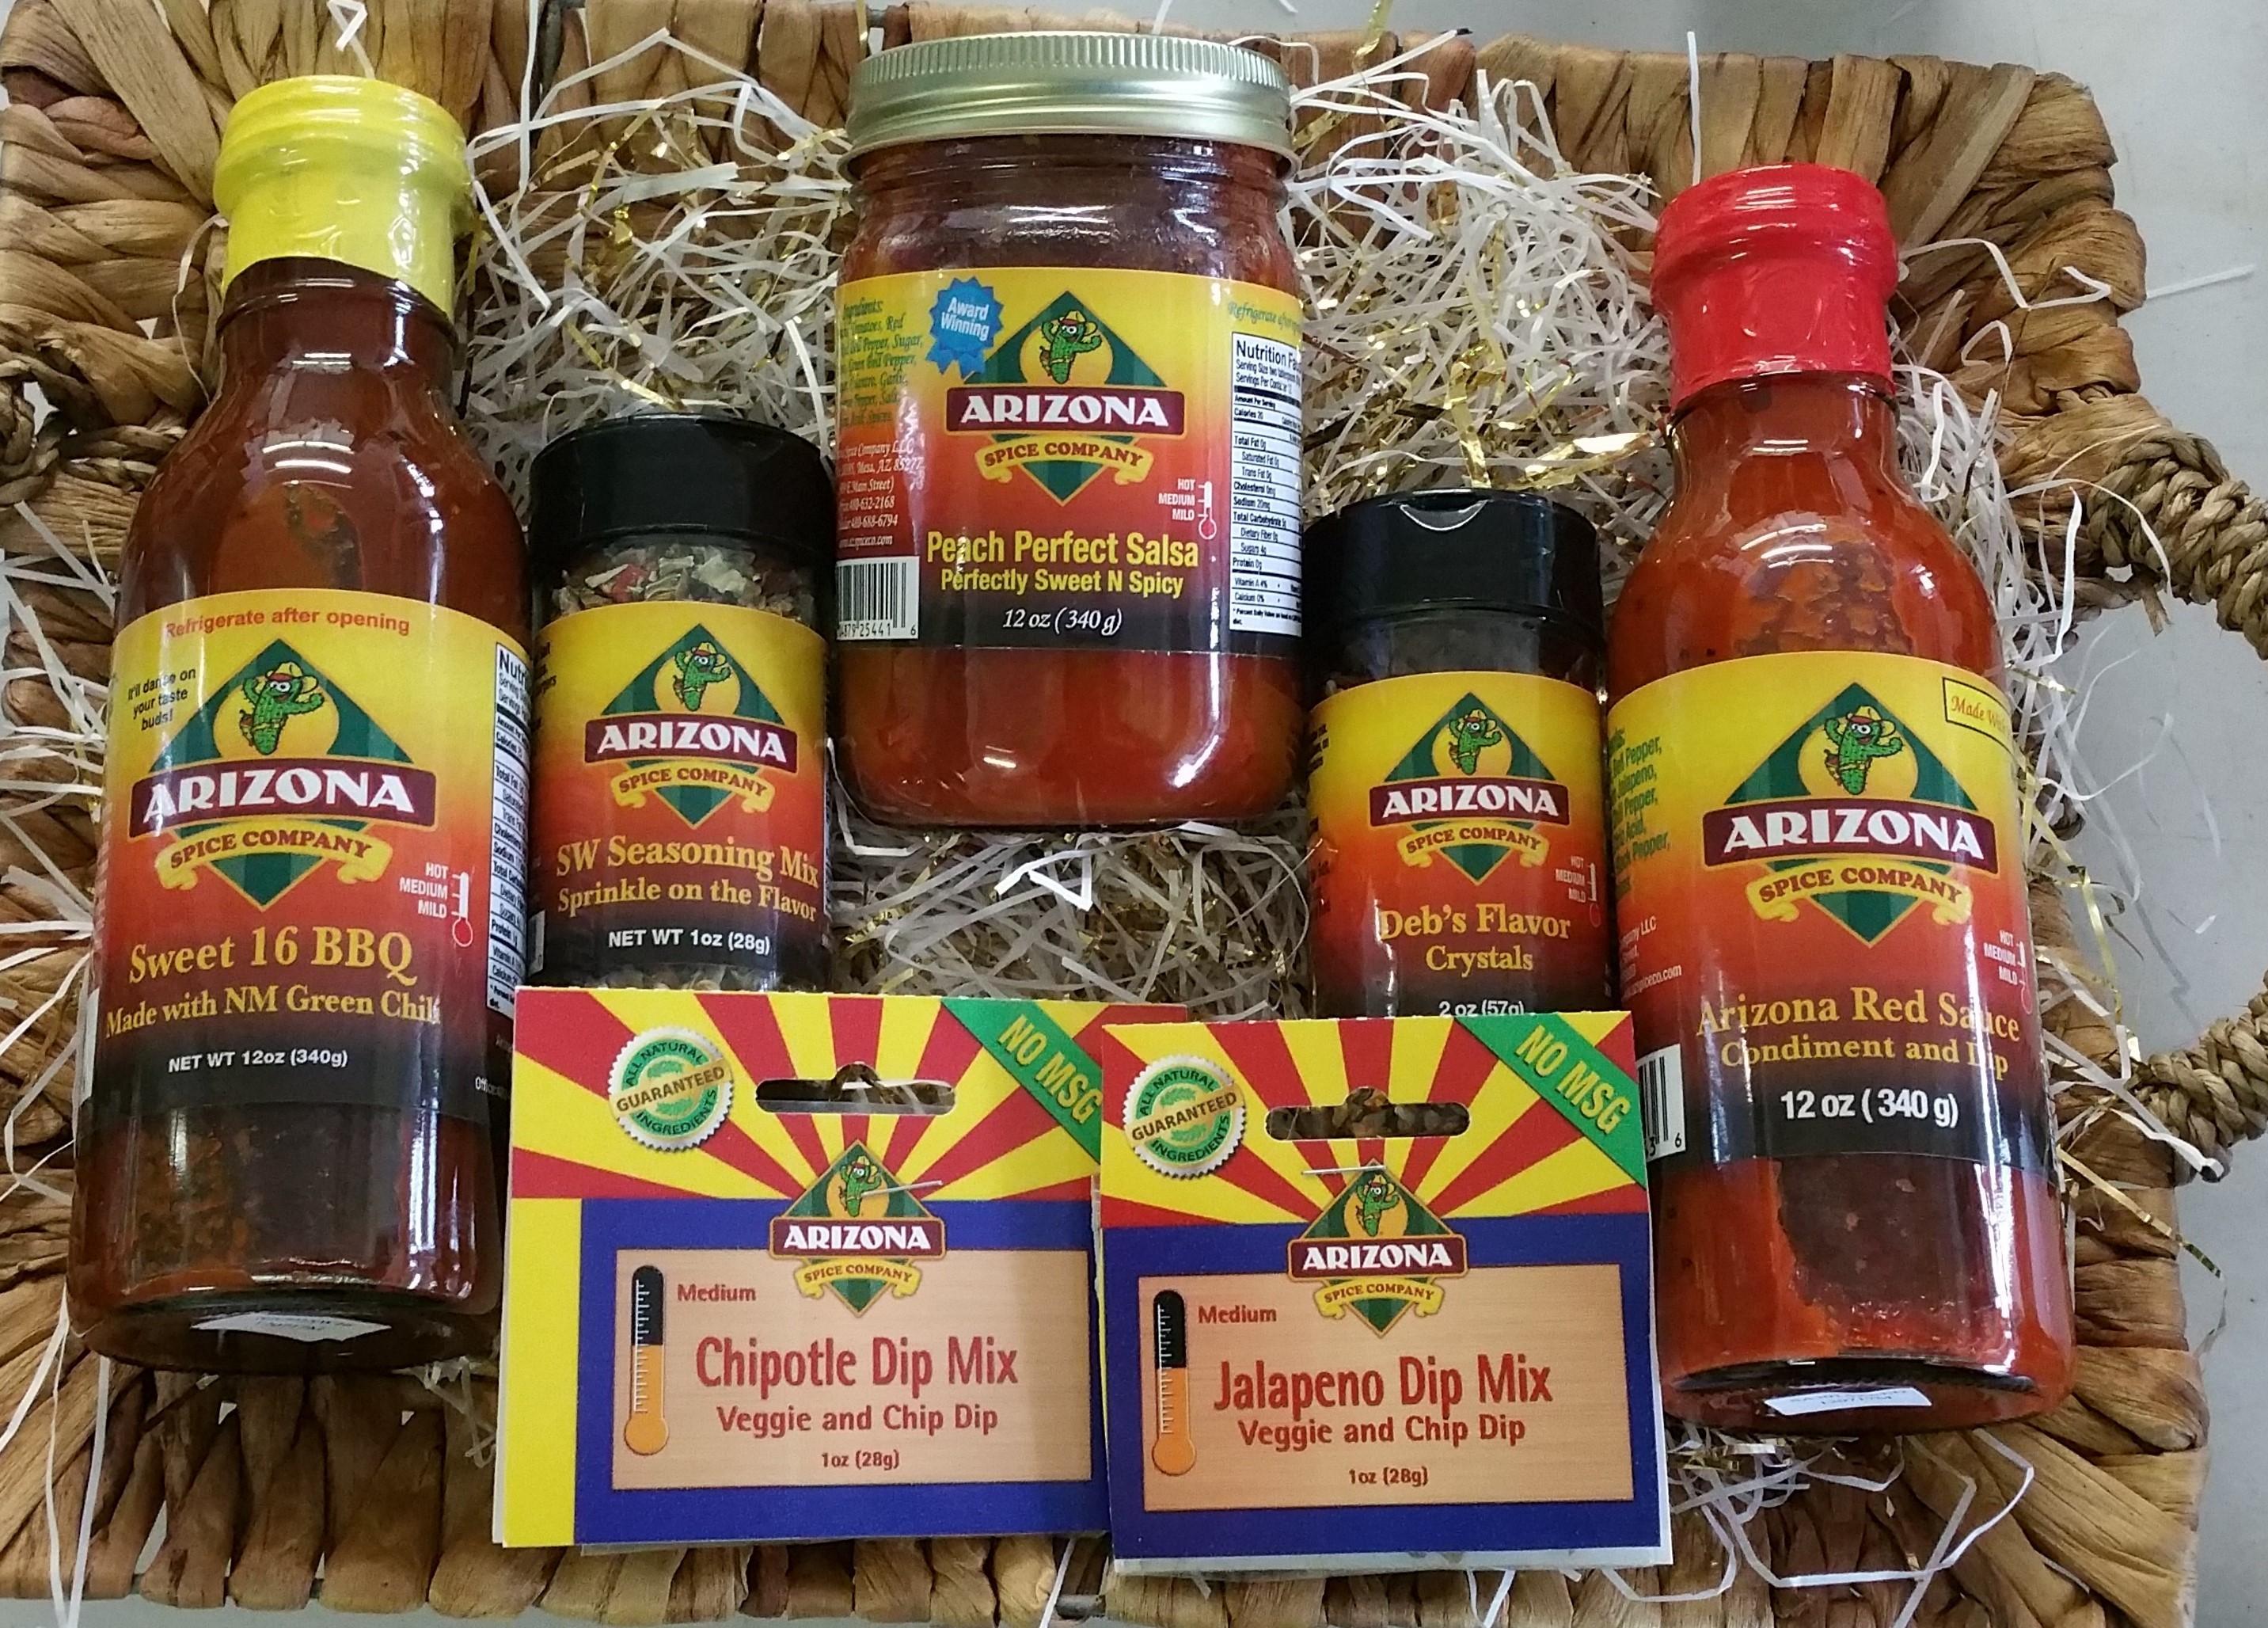 Arizona Salsa and Spice Co image 5